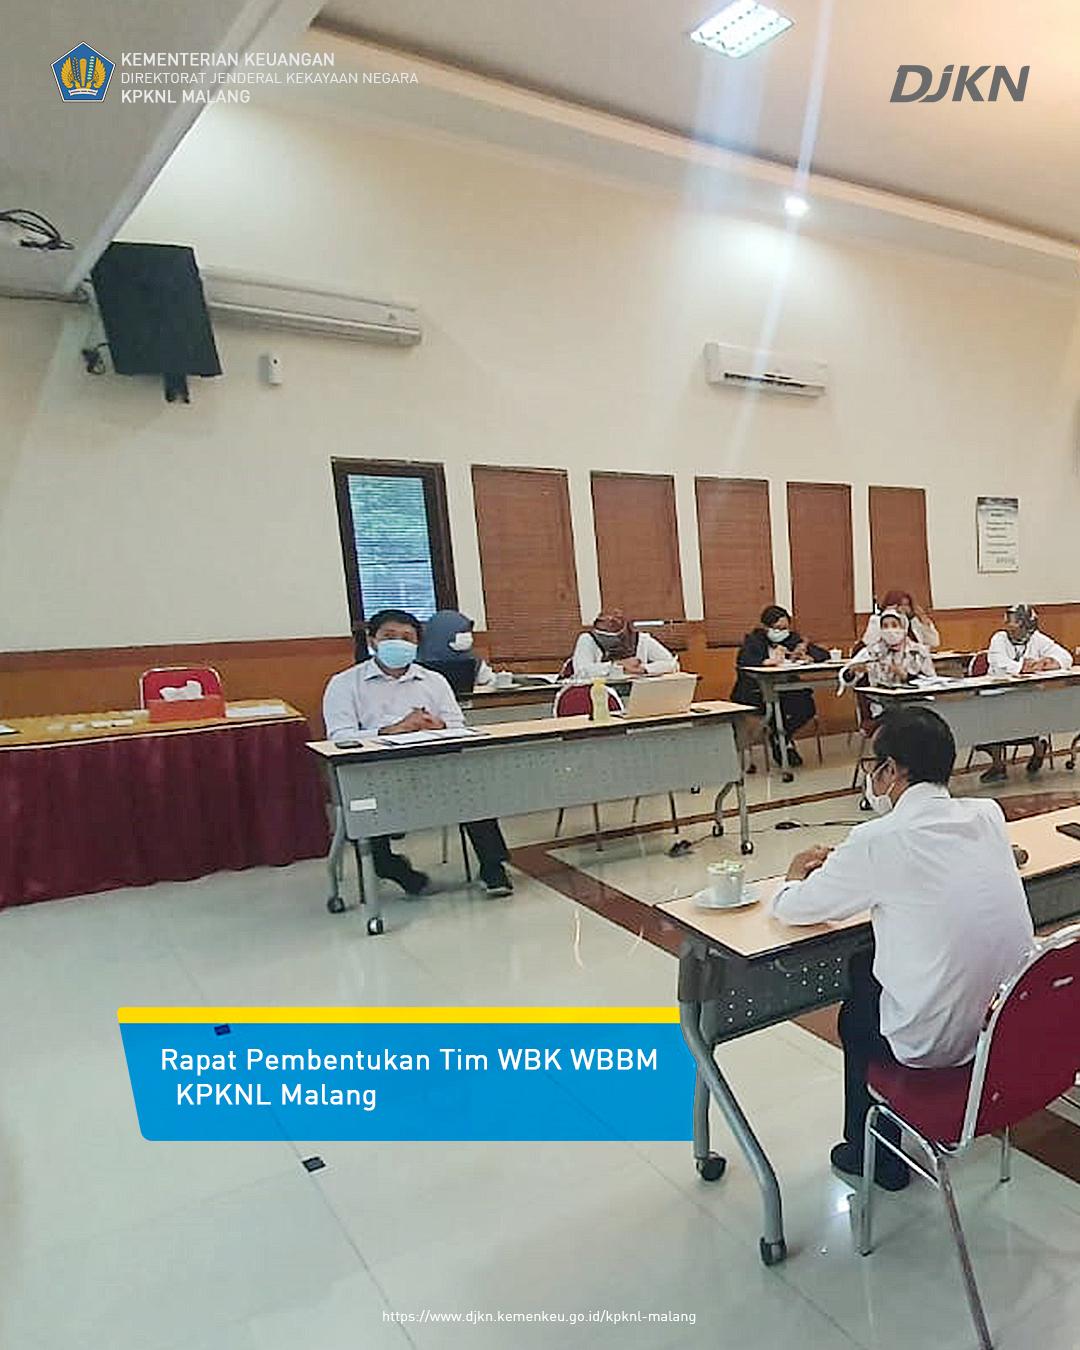 Rapat Pembentukan Tim WBK / WBBM KPKNL Malang